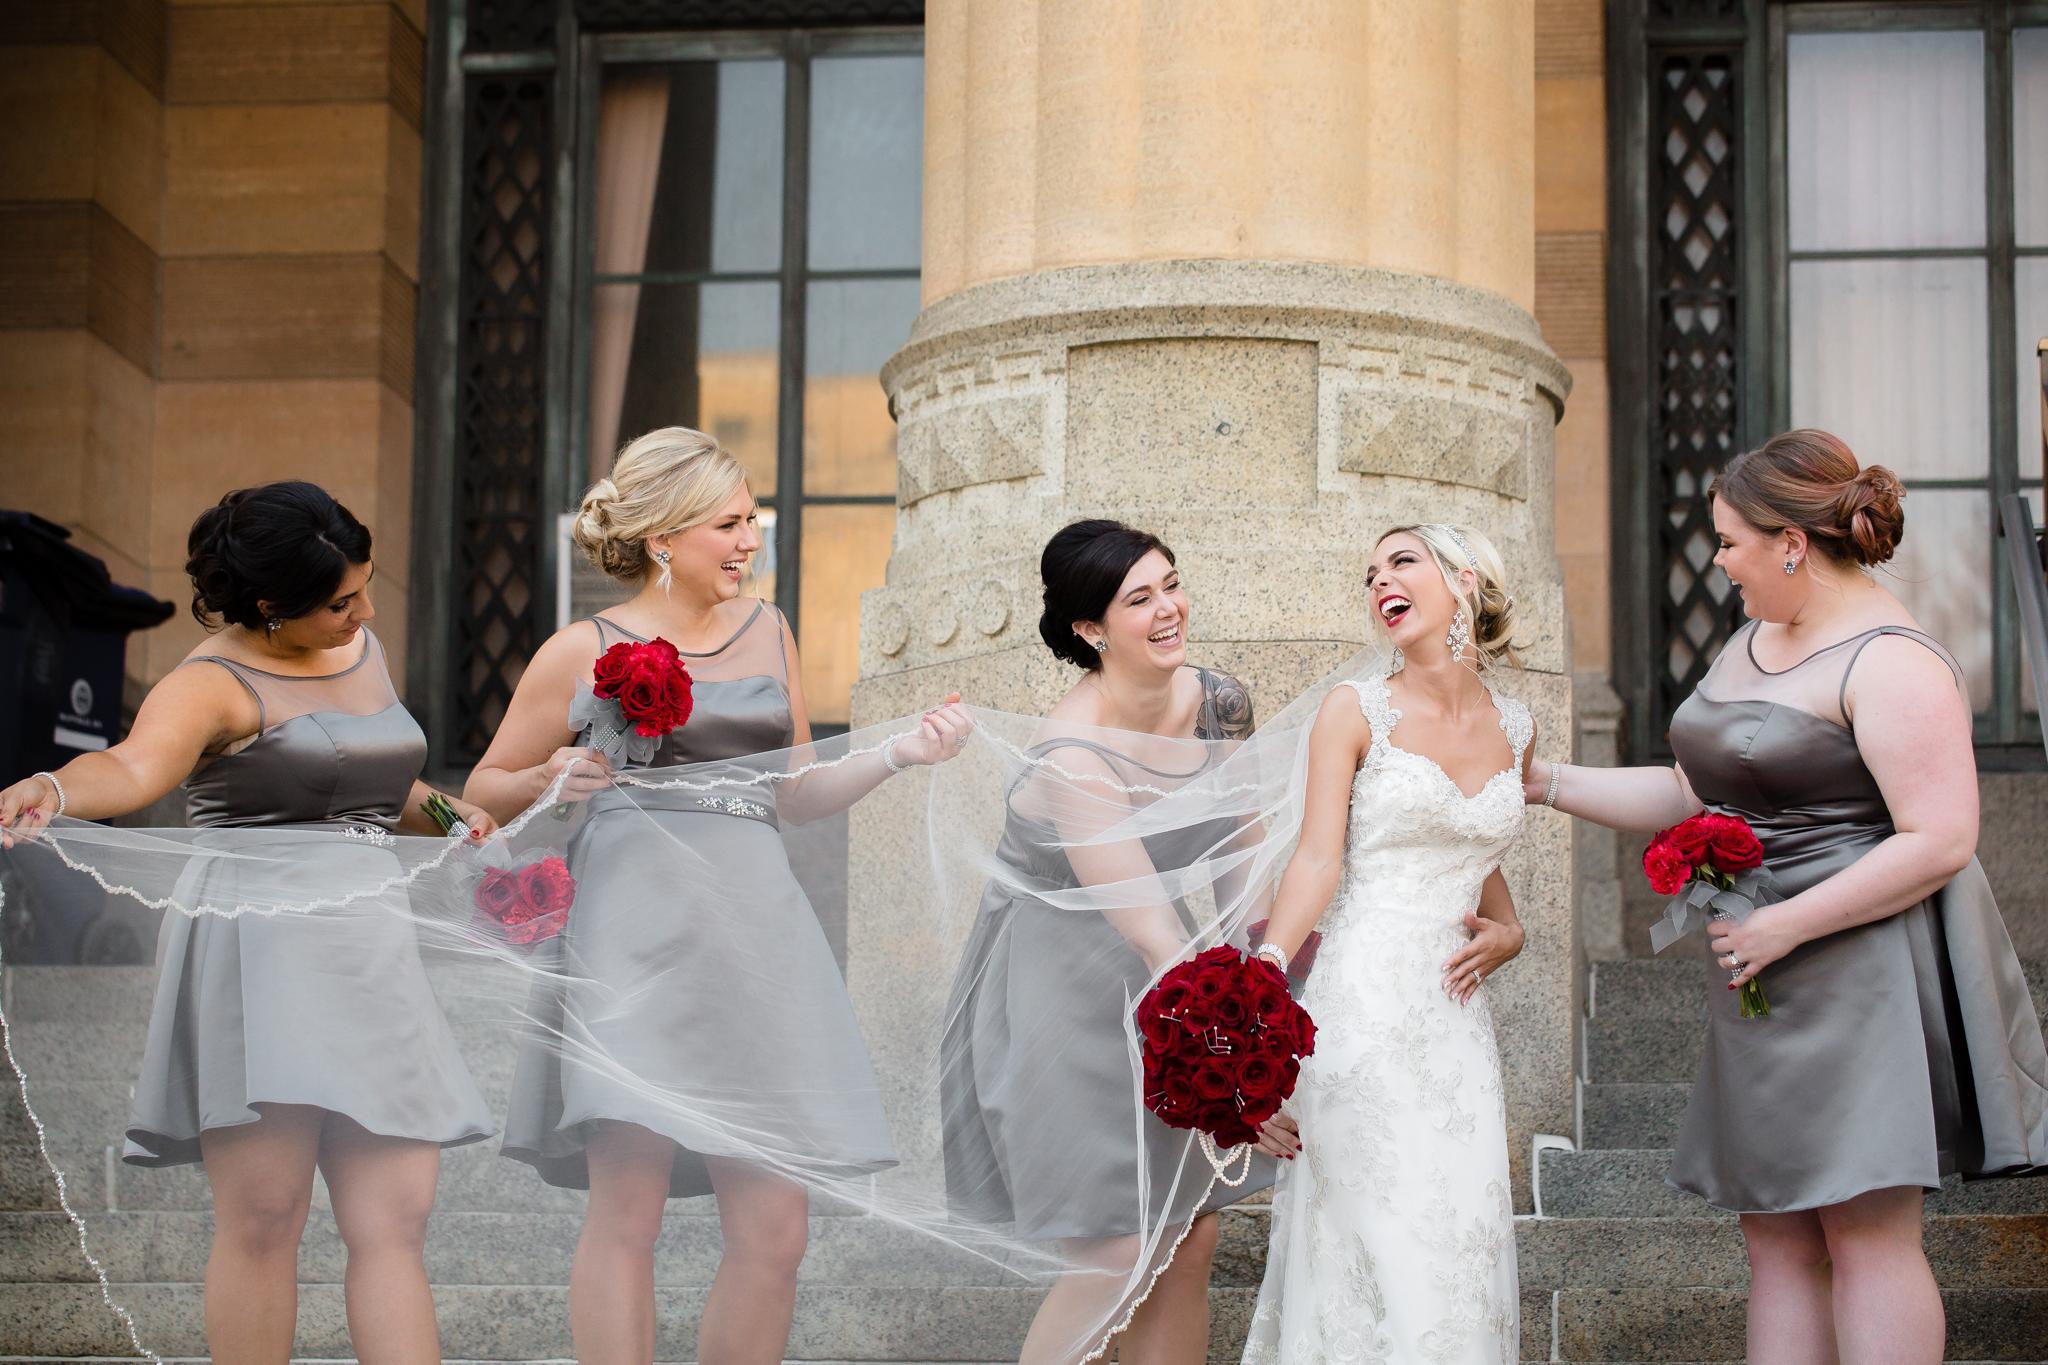 Statler-City-Buffalo-wedding-photographer- 0394.jpg